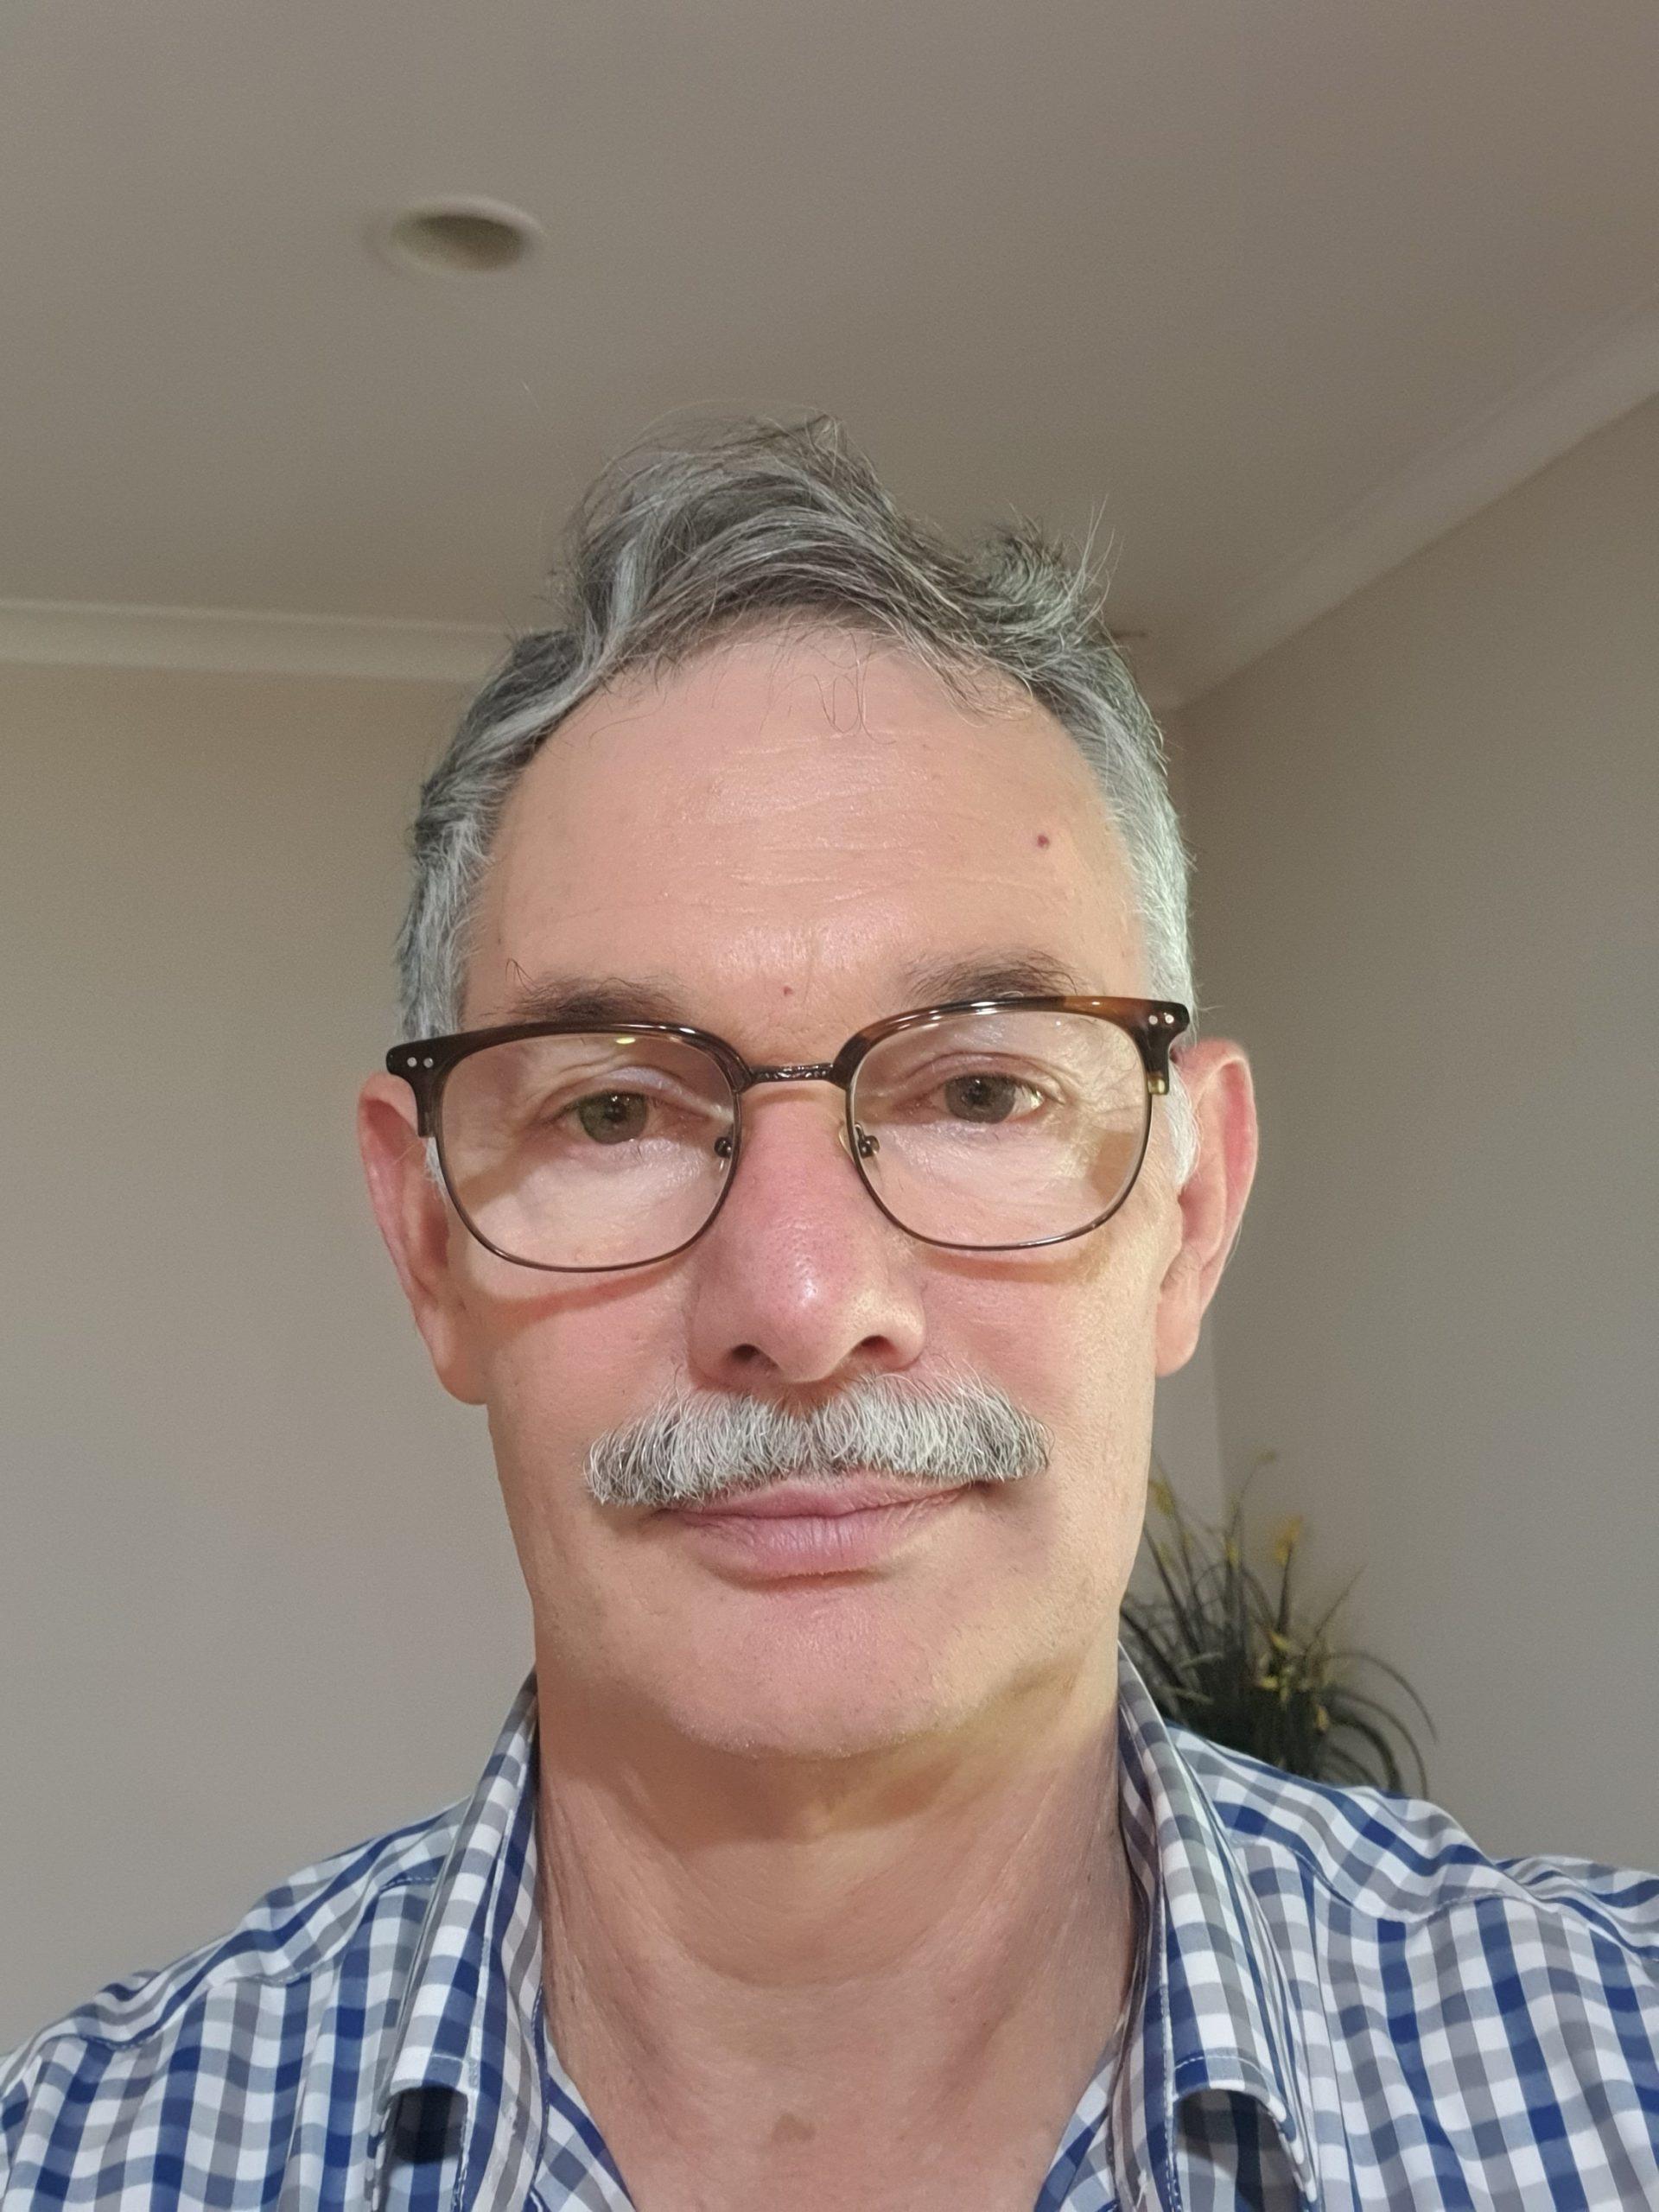 Developer Stories: John Hardy Elaborates More On His Equation Visualization Application